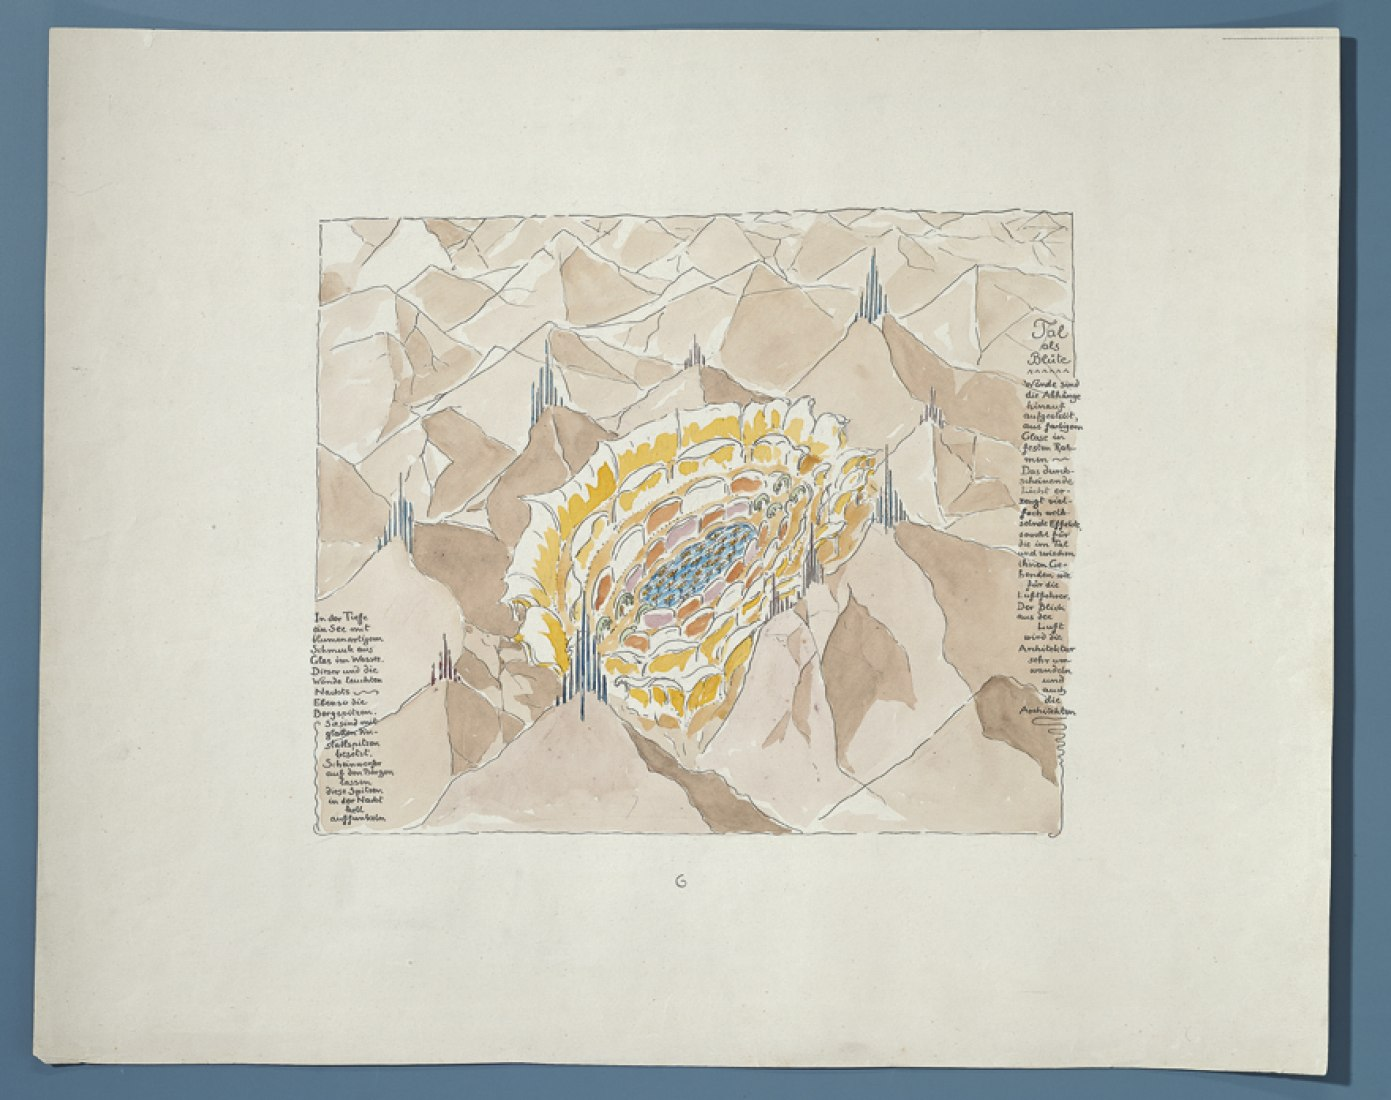 Courtesy of CBA. Alpine architecture, by architect Bruno Taut, c. 1917-1919.